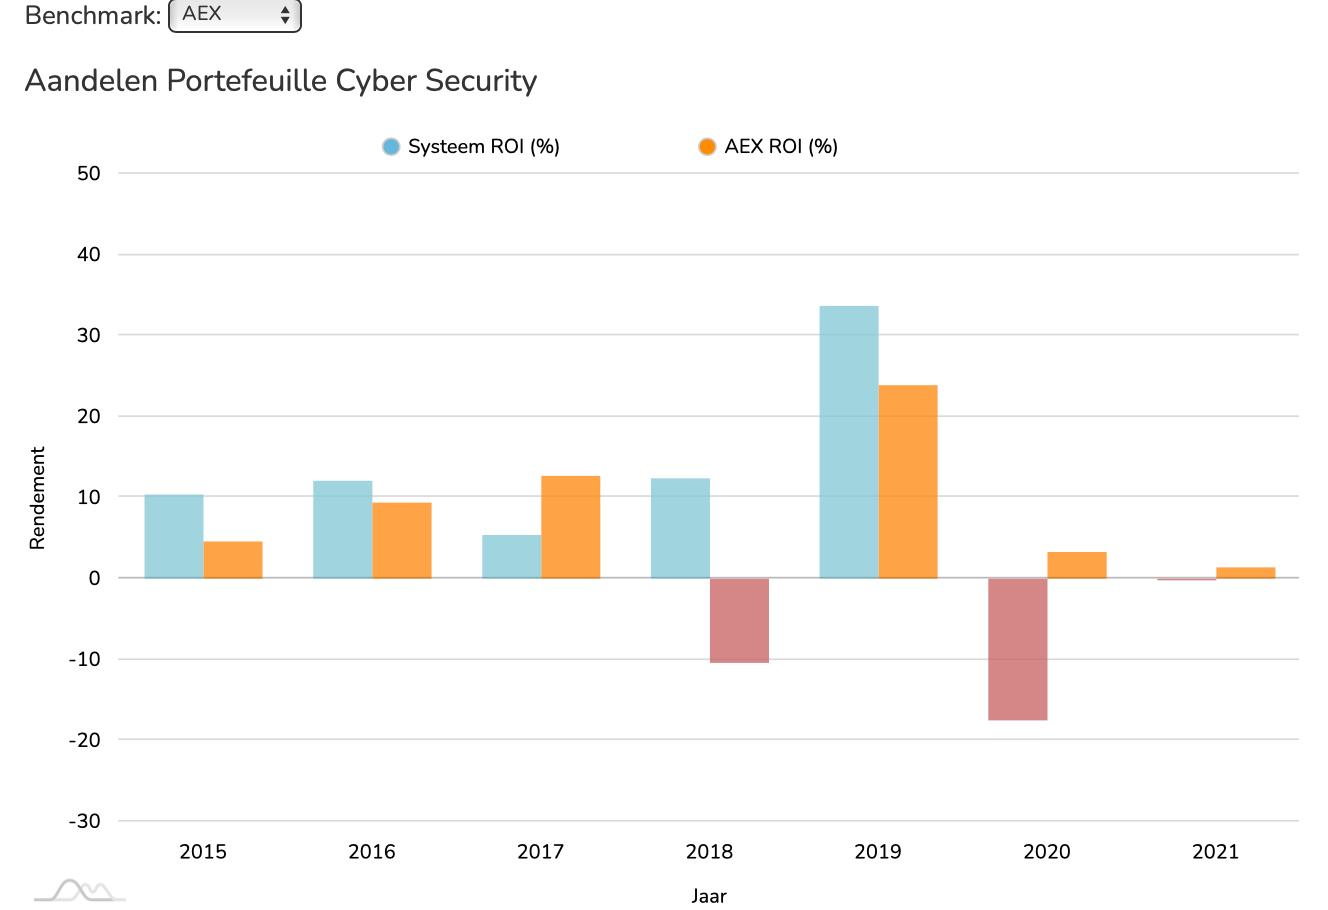 Aandelen Cyber Sec ROI vs AEX